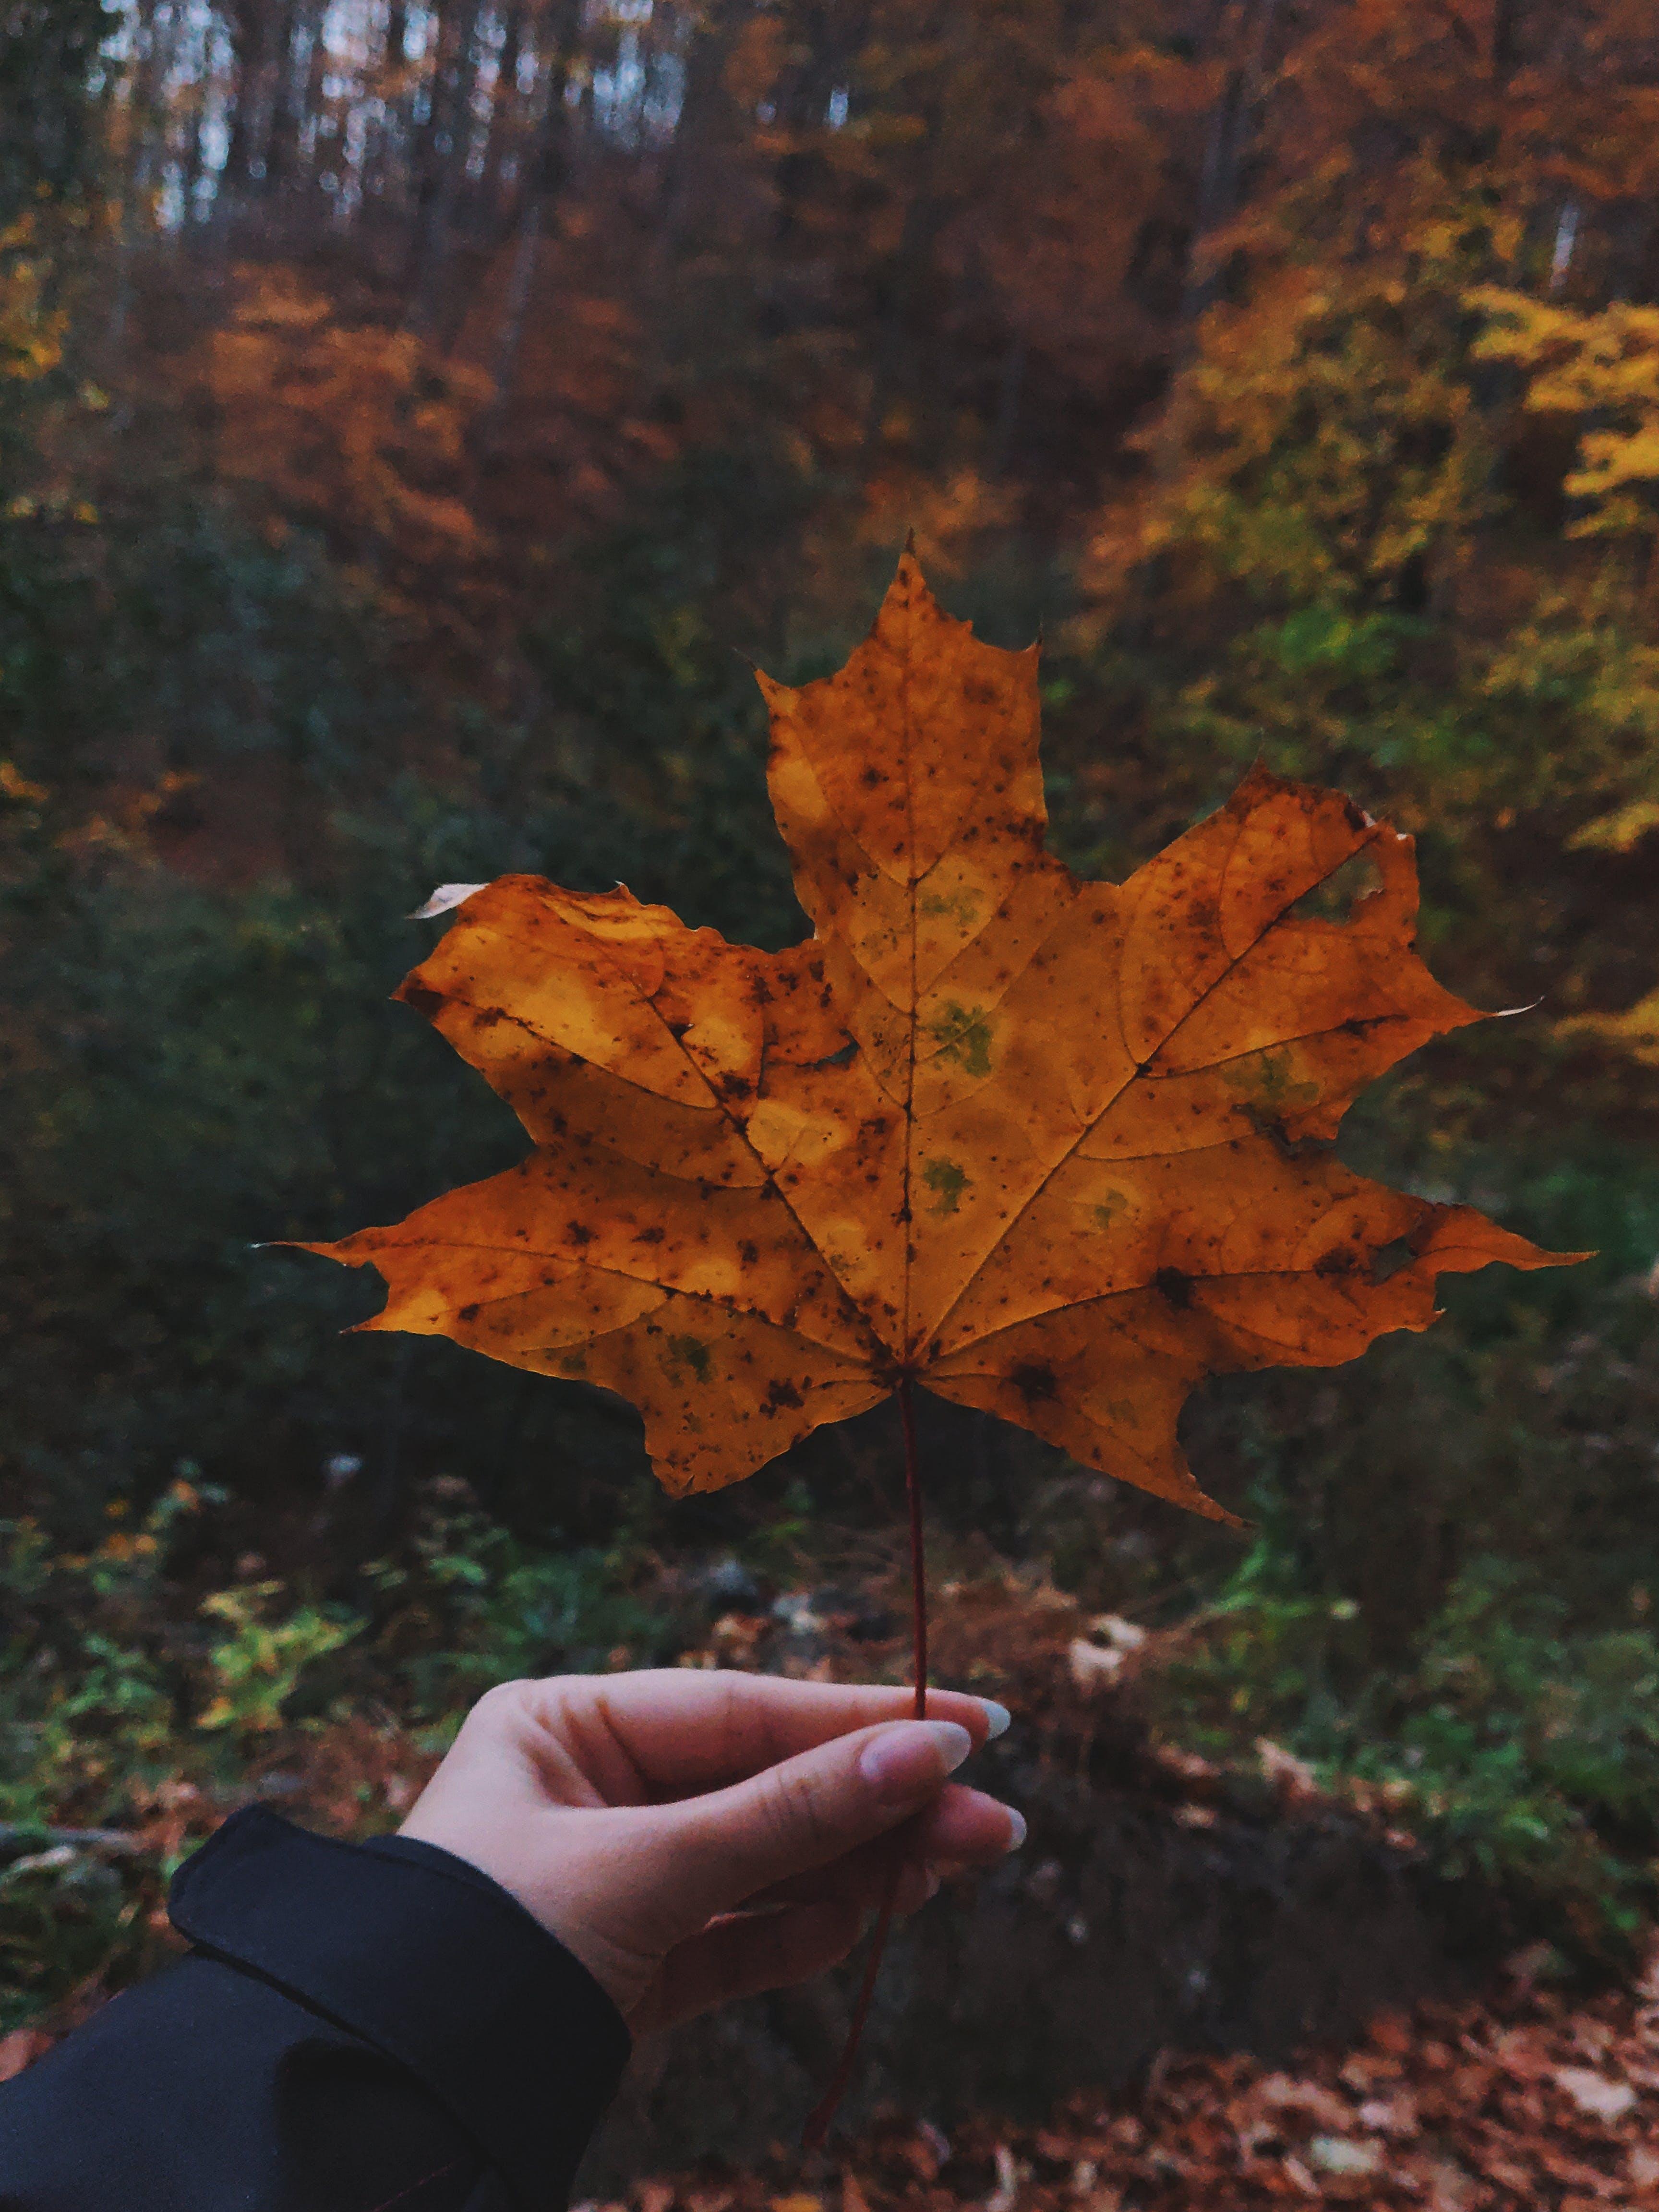 Person Holding Orange Maple Leaf during Dayitme